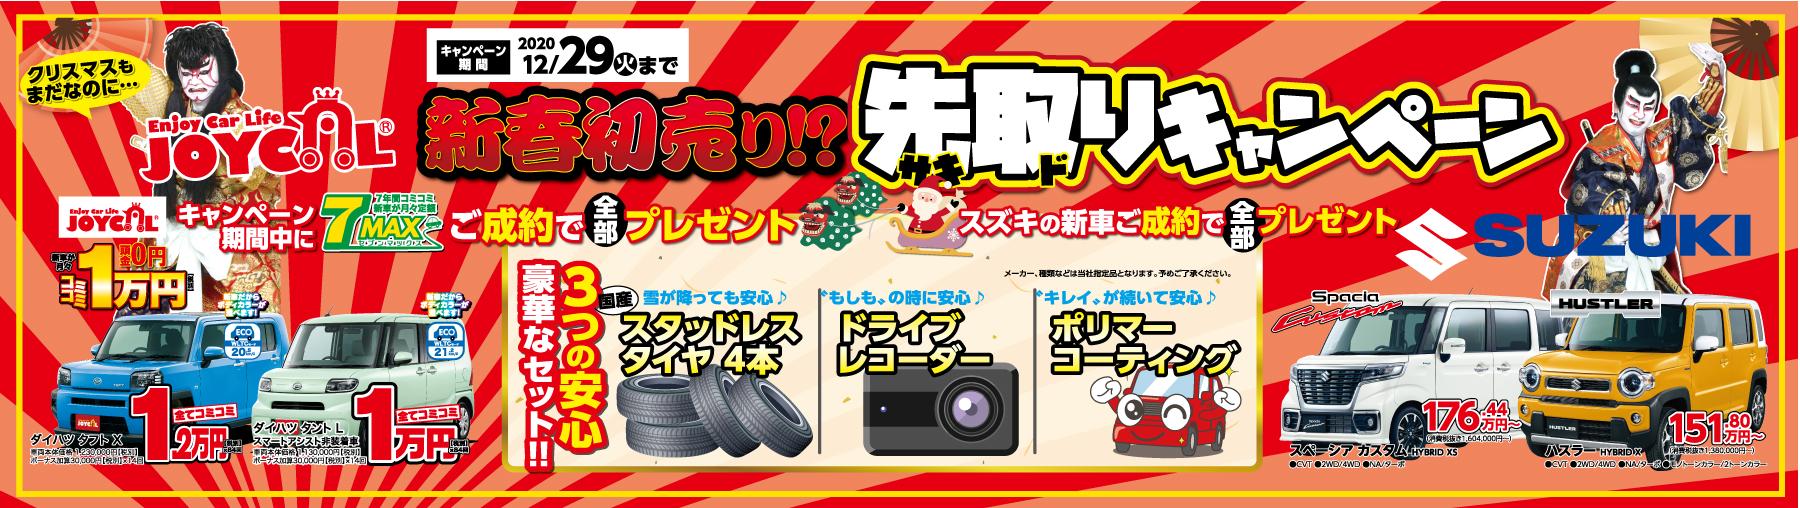 JOYCAL 車楽工房西条店「新春初売り!?」先取りキャンペーン